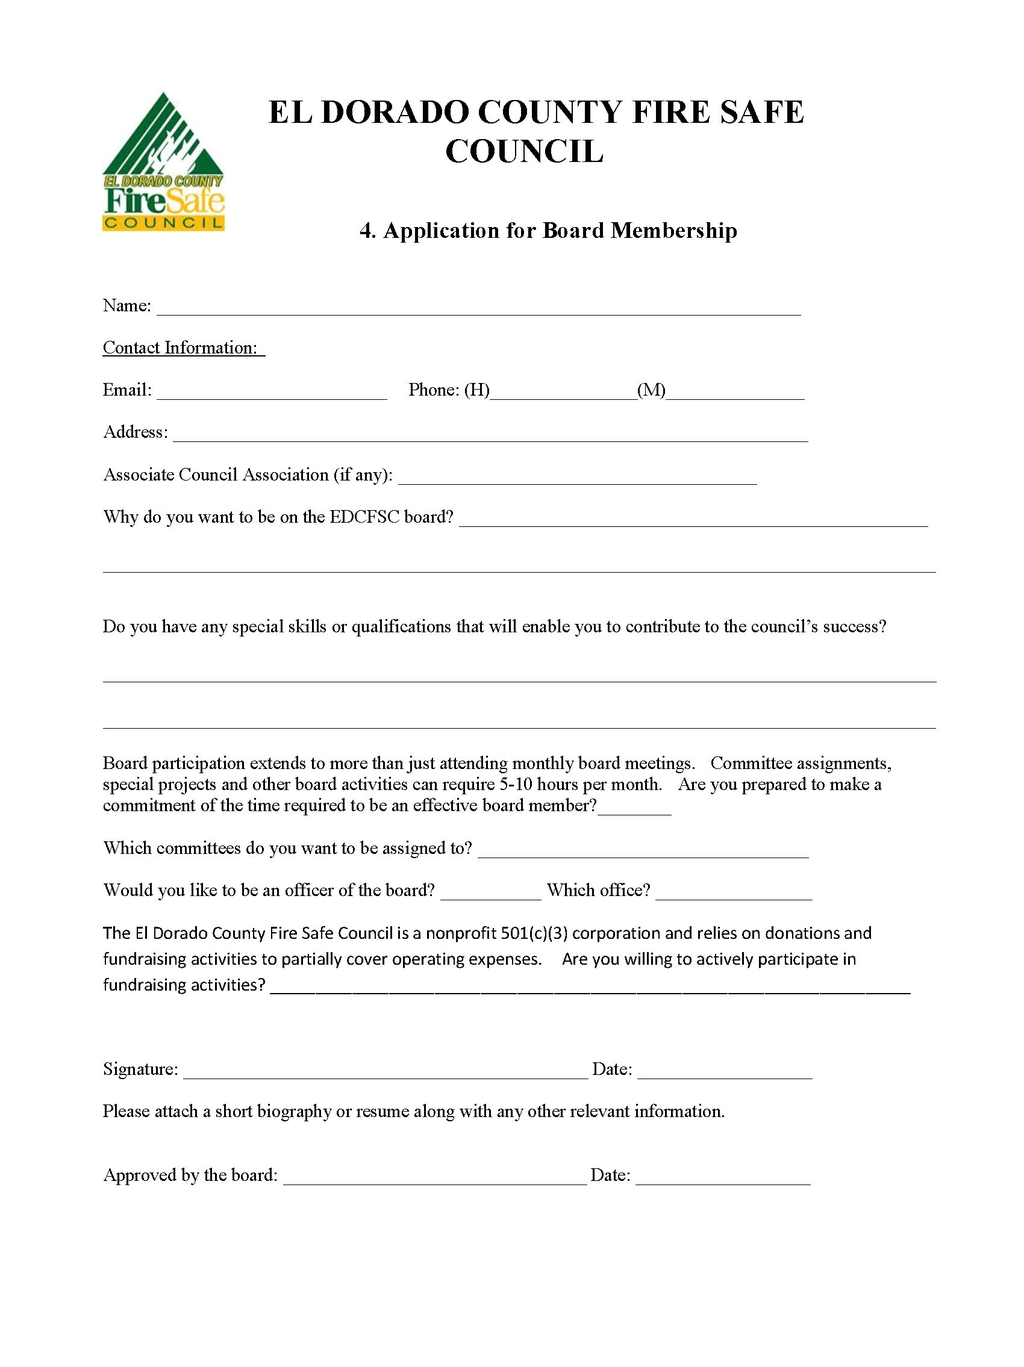 4-Application-for-Board-Membership-Form-3.2019.jpg